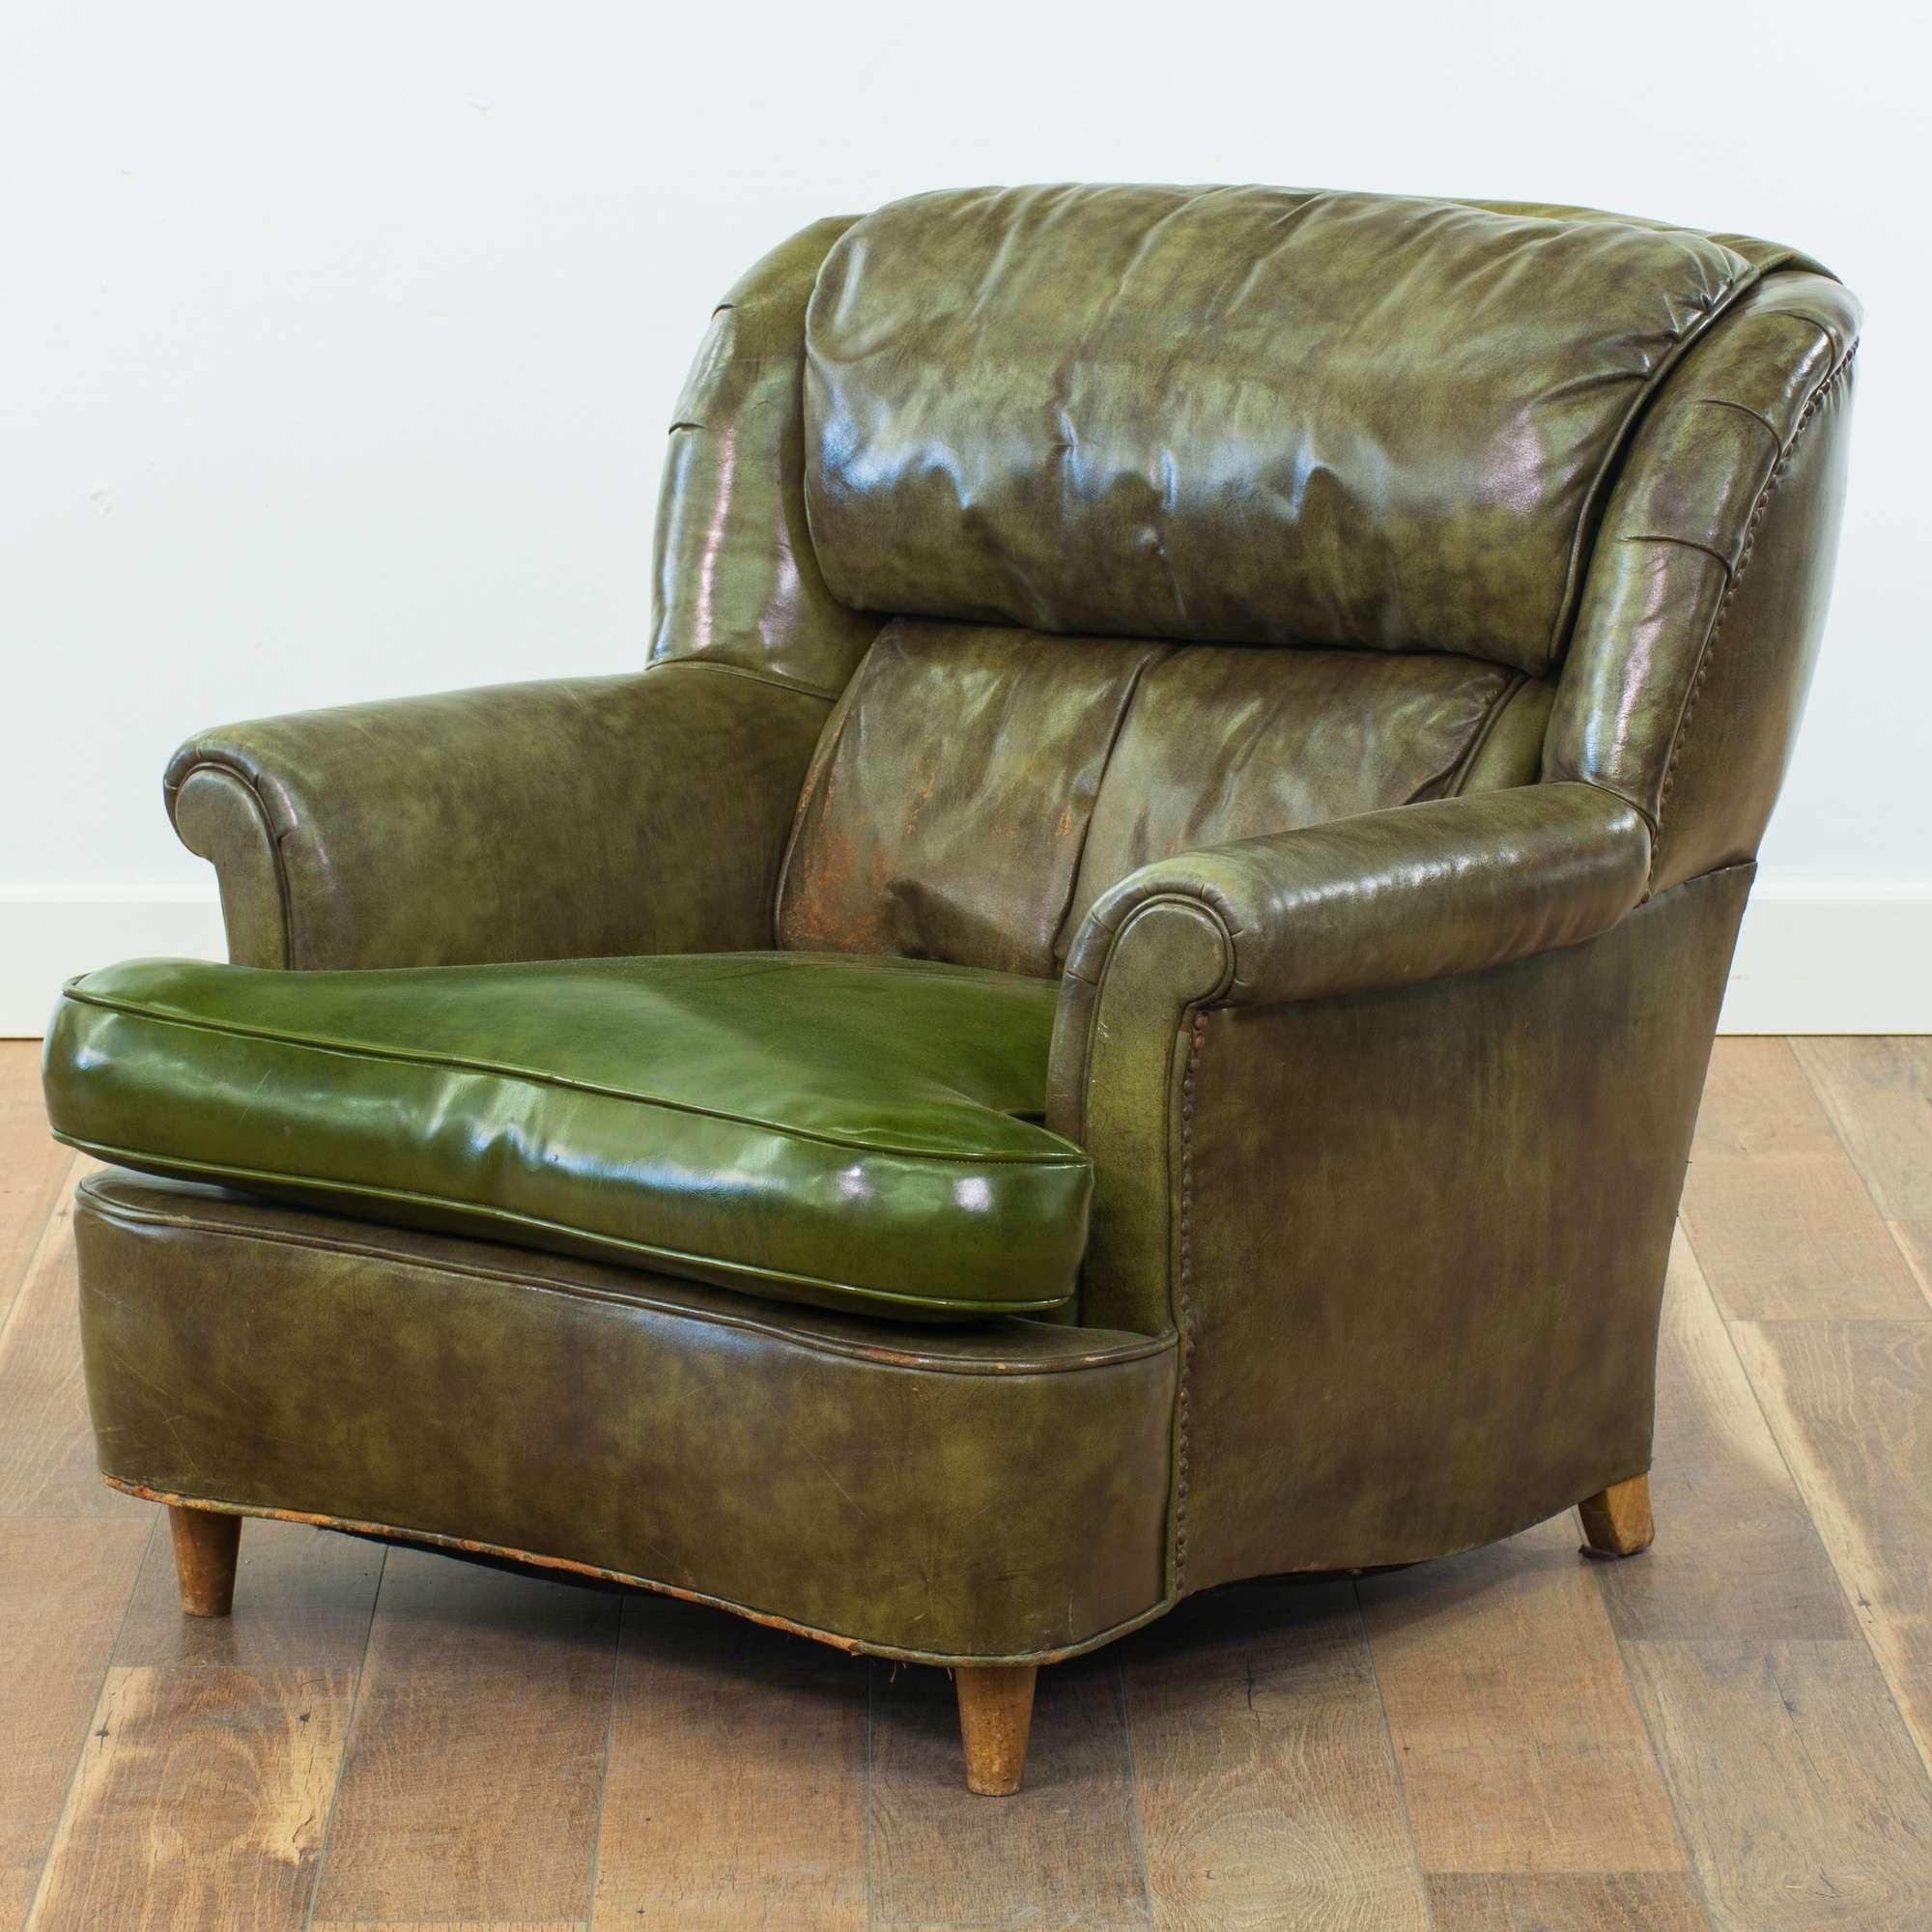 Green Leather Overstuffed Armchair | Loveseat Vintage ...